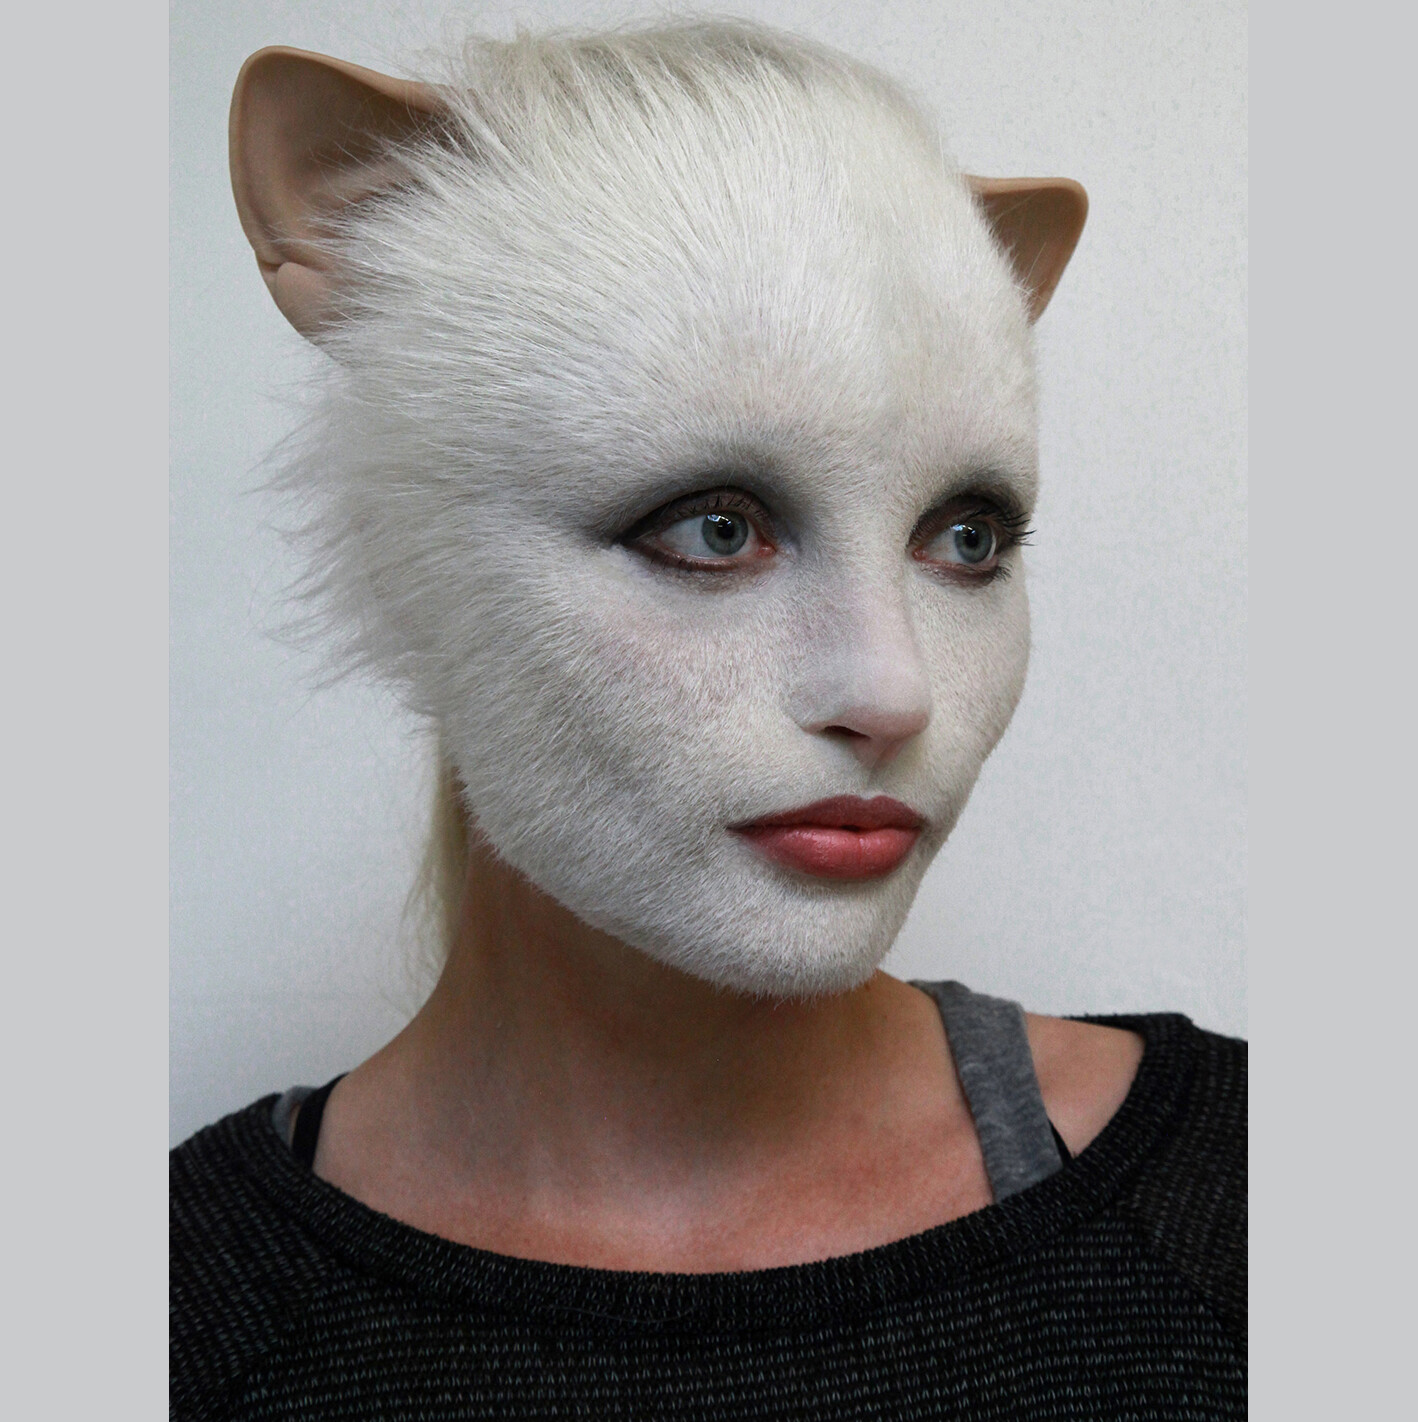 Cats/ Pitch 2016 Prosthetic Sculpture/ Test Makeup